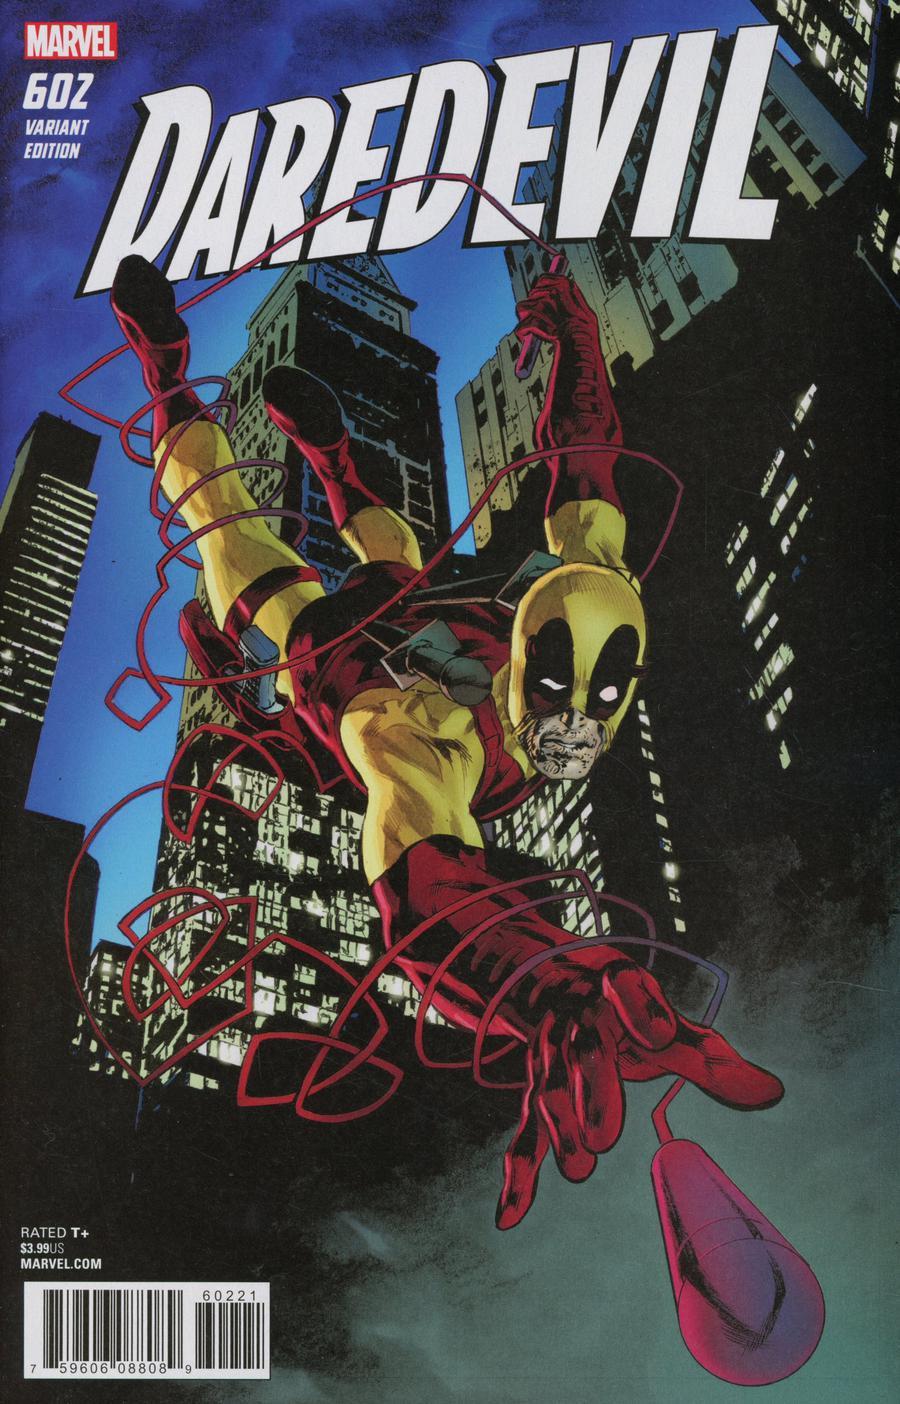 Daredevil Vol 5 #602 Cover B Variant Mike Perkins Deadpool Cover